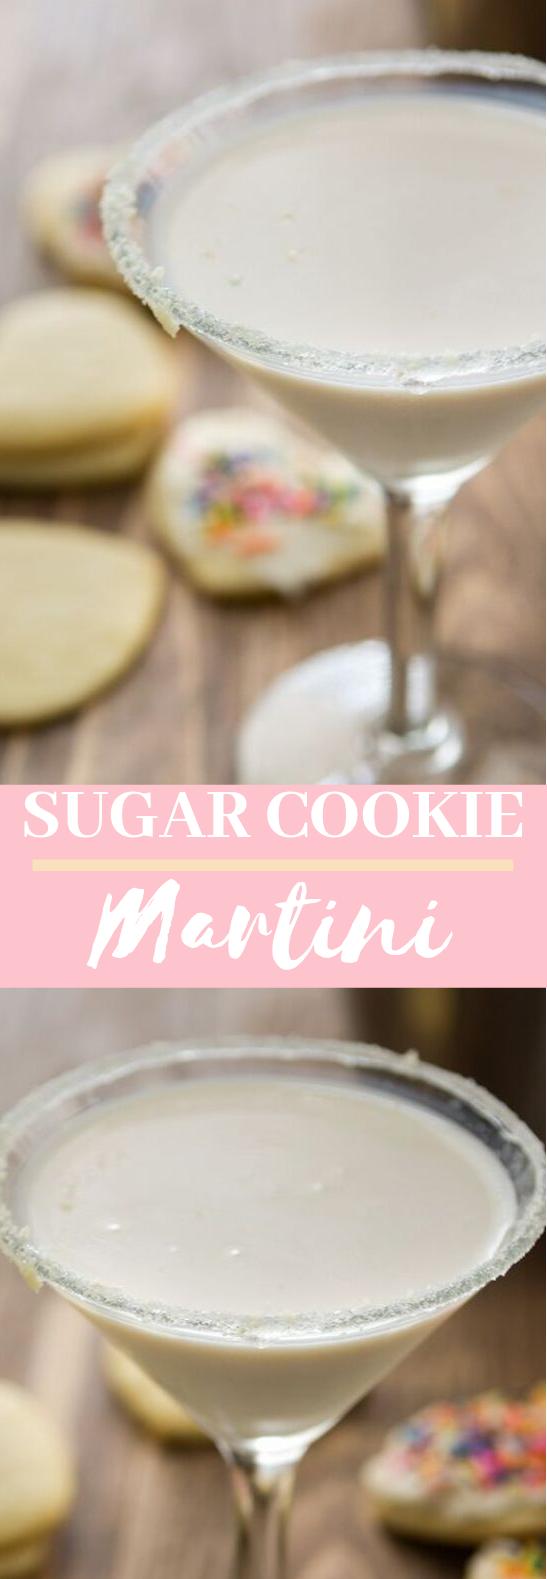 Sugar Cookie Martini #drinks #cocktails